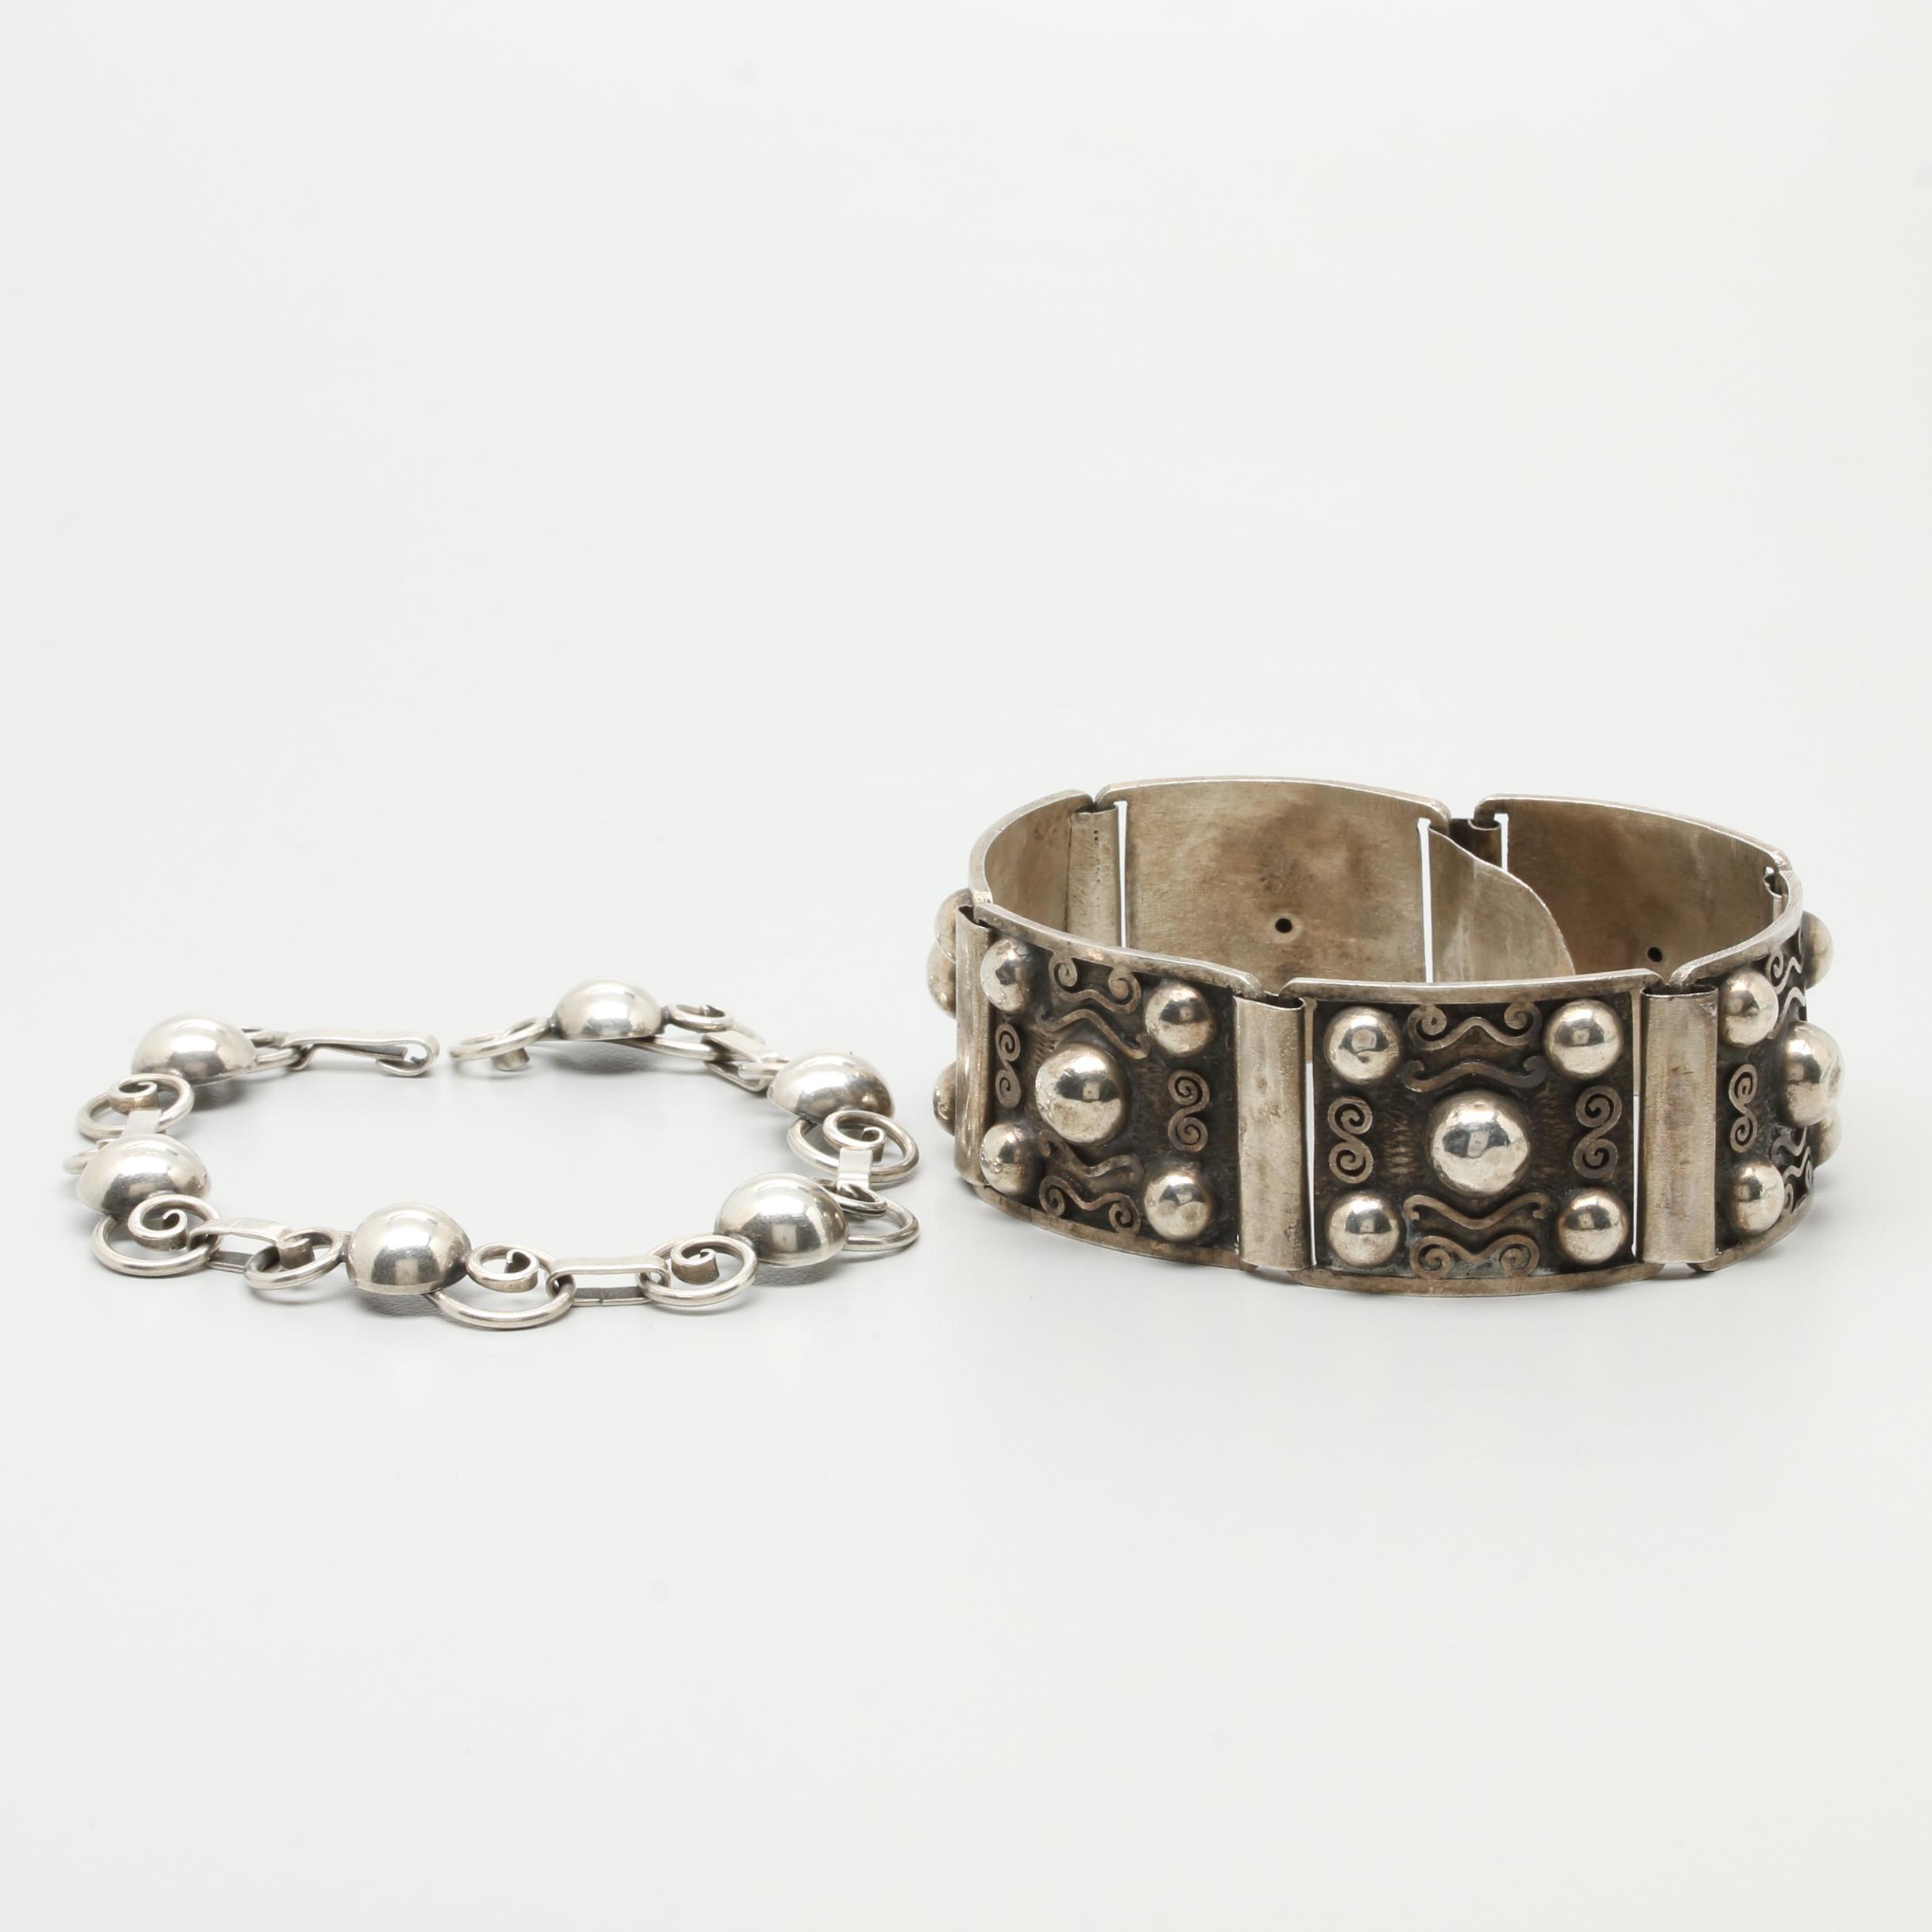 900 and Sterling Silver Bracelets